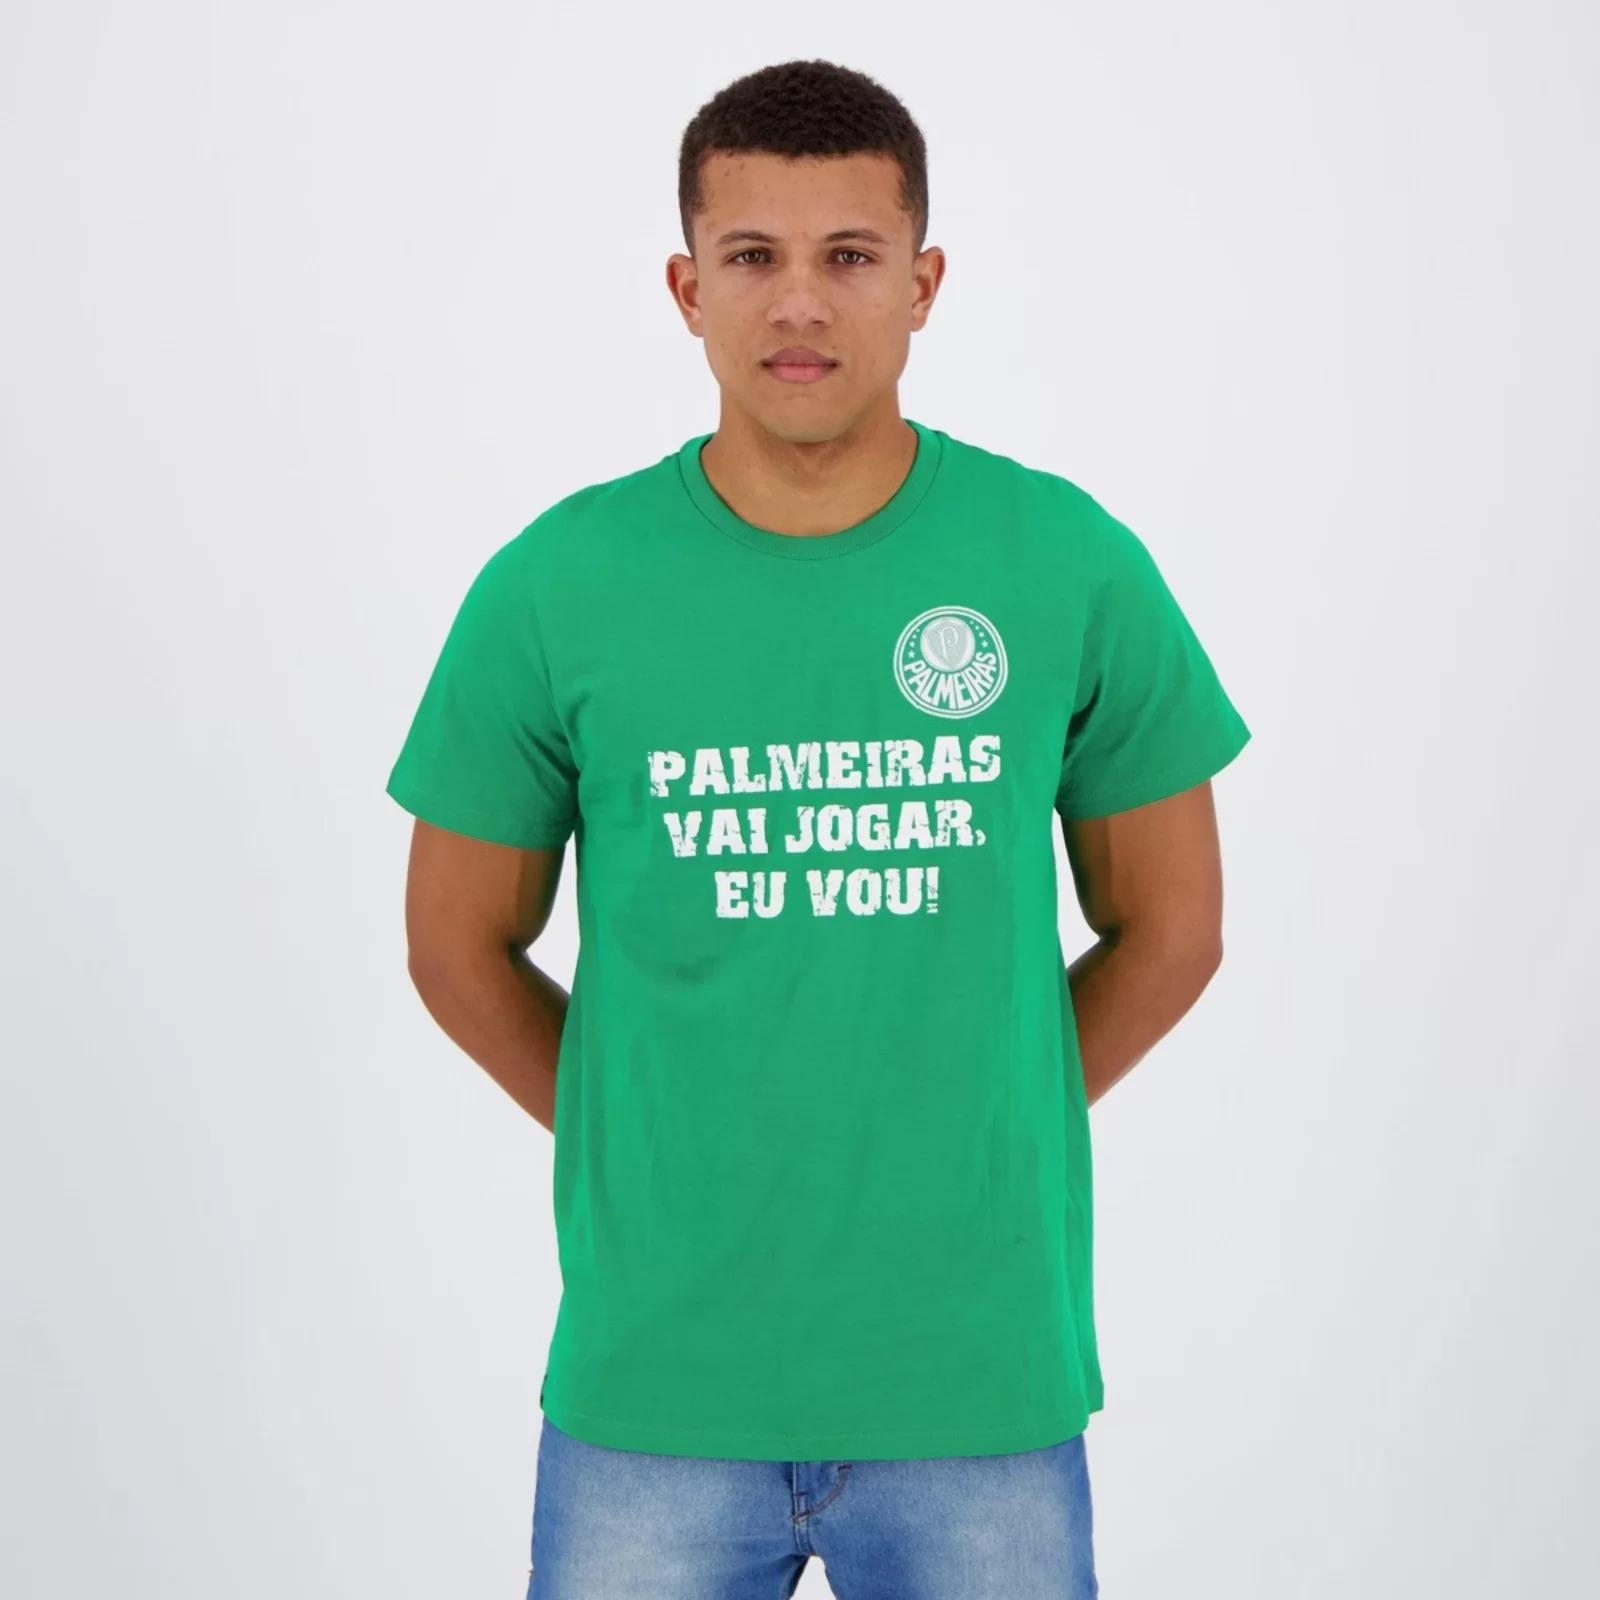 Camisa Palmeiras vai jogar